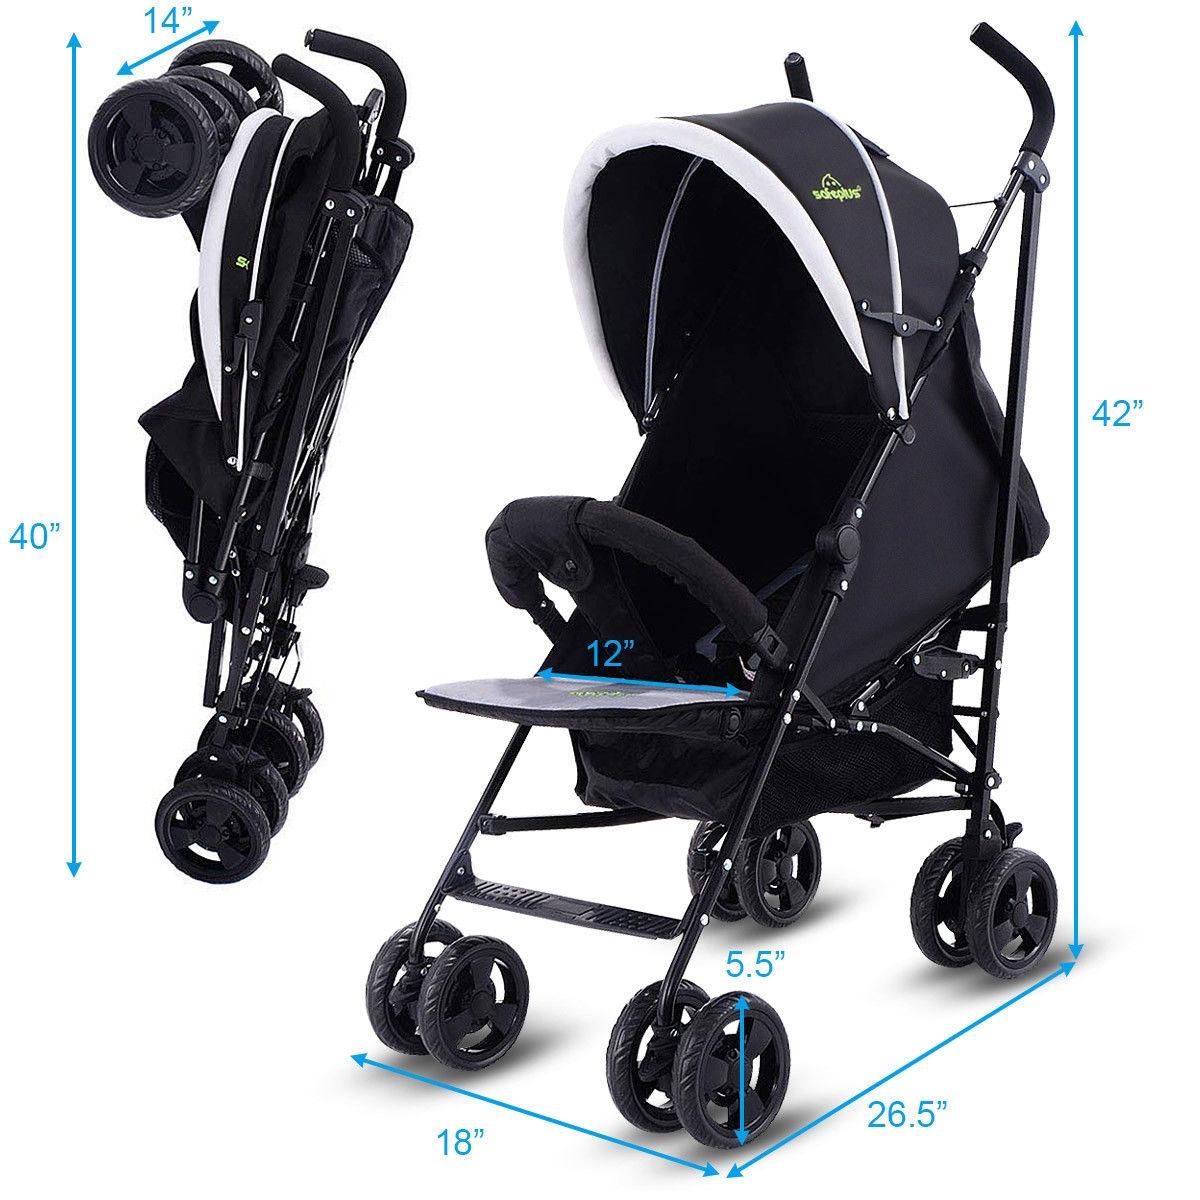 Lightweight Foldable Kids Pushchair Baby Stroller-Black